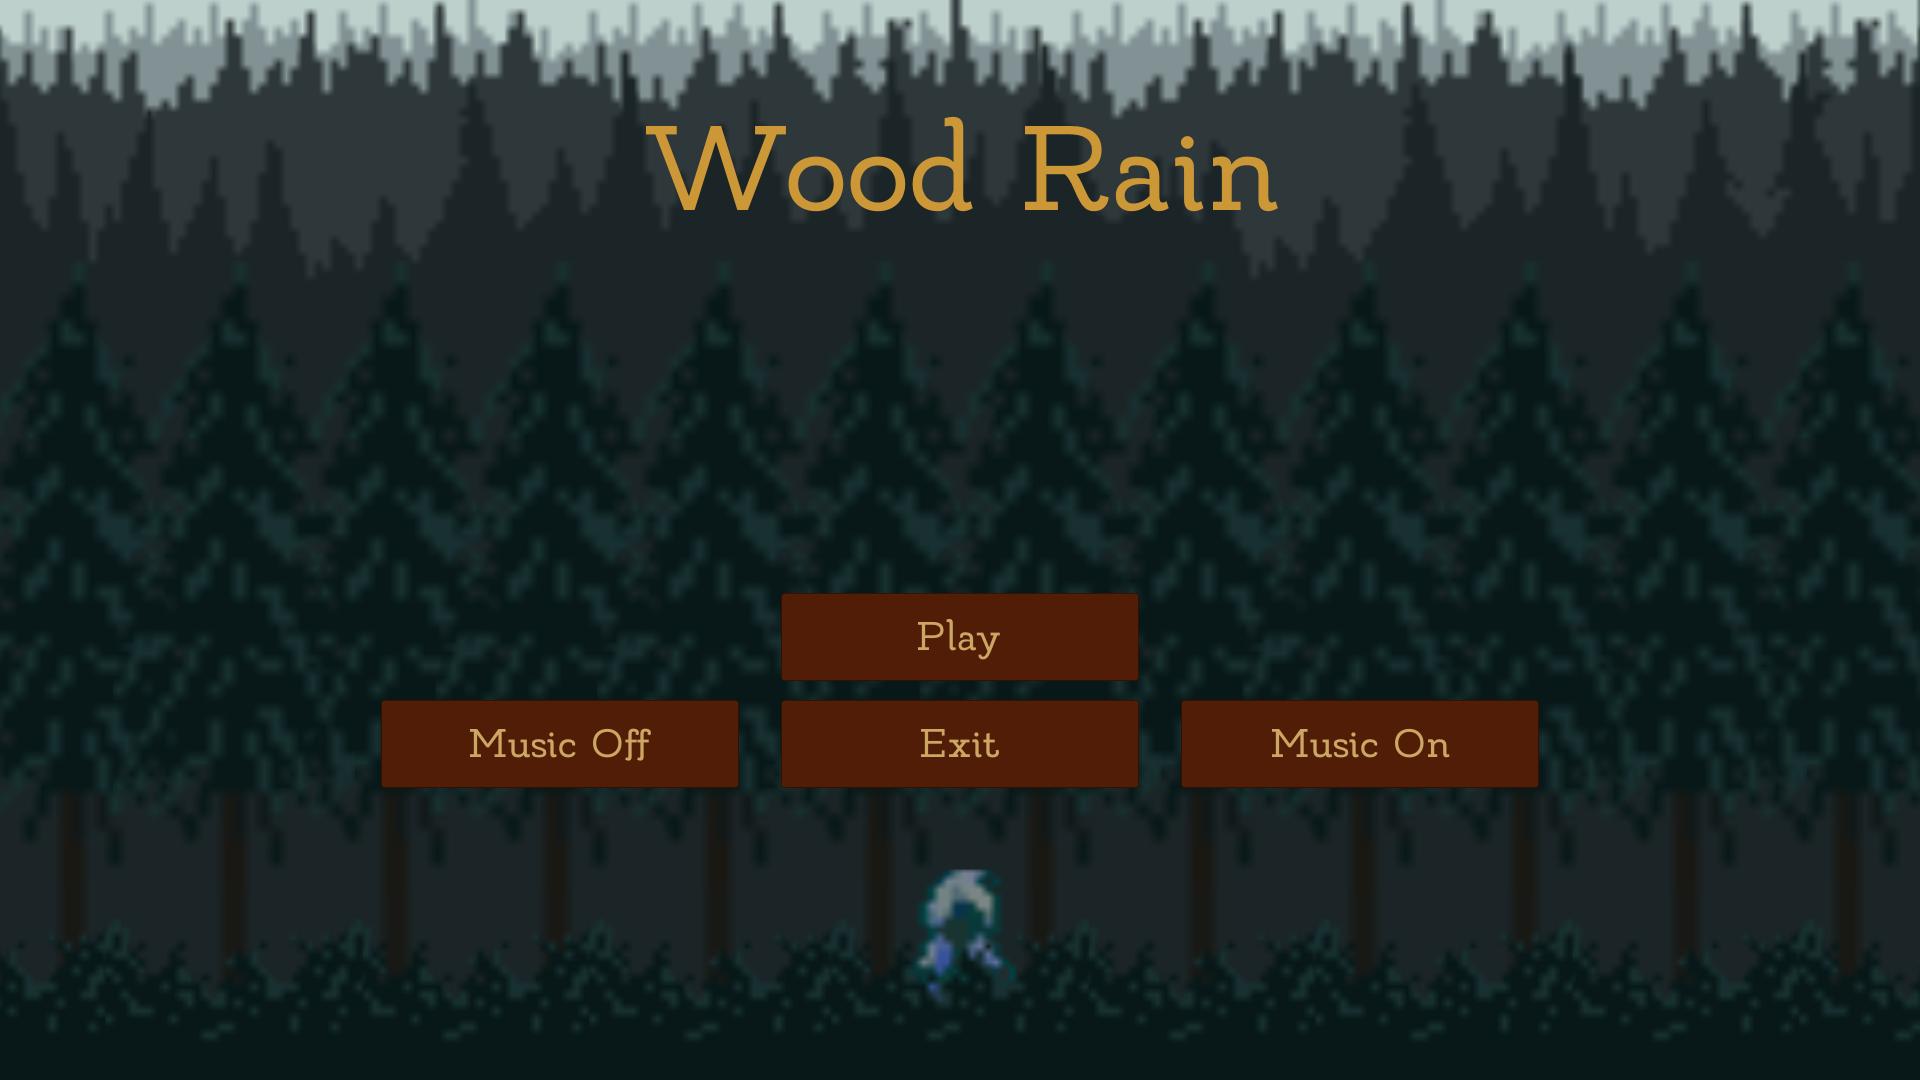 Wood Rain